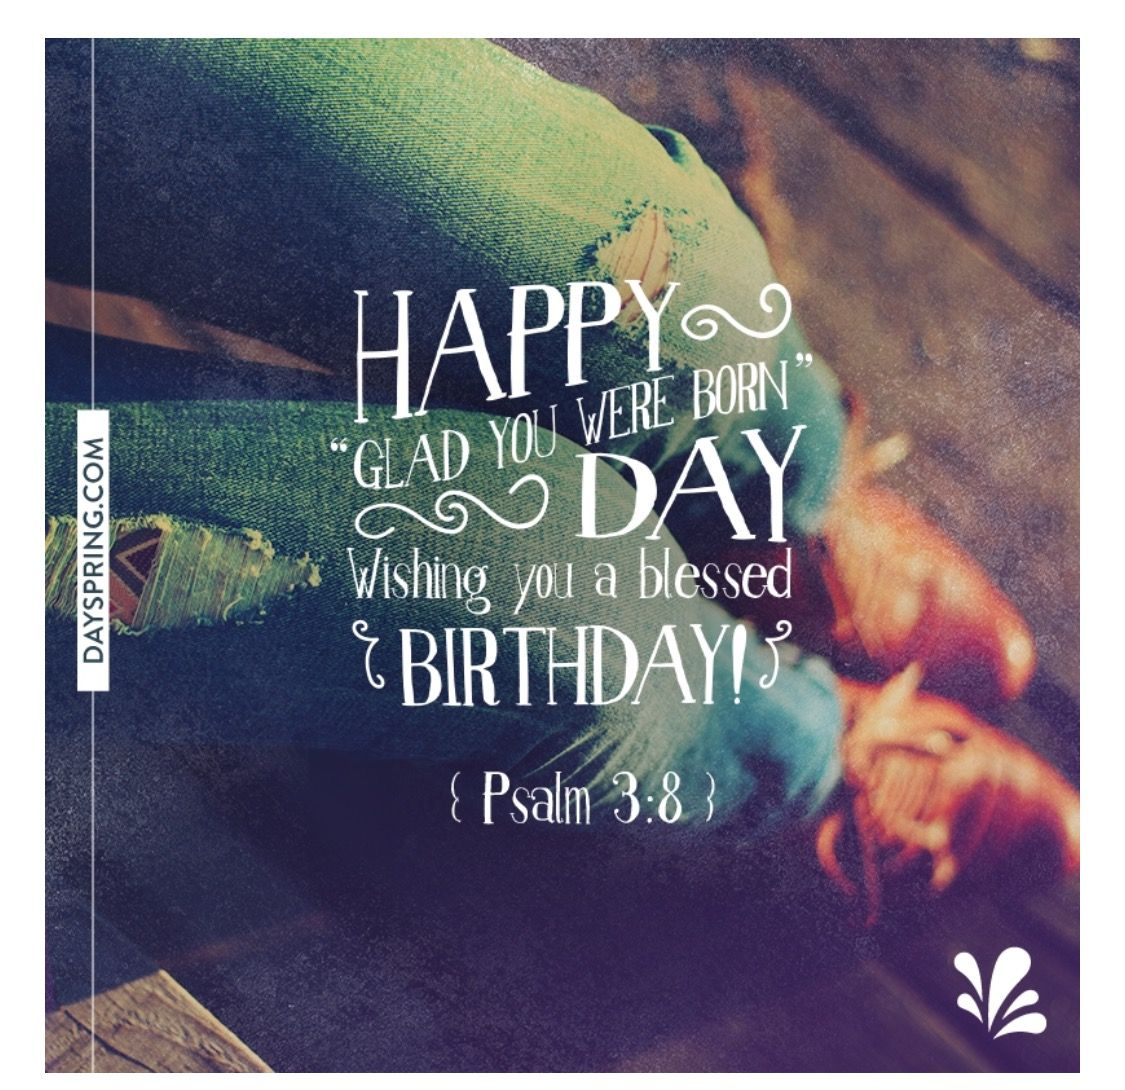 Mind Happy Glad You Were Born Pin By Damaris Maldonado On Birthday Wishes Pinterest Birthdays Happy Birthday Blessings Nephew Happy Birthday Blessings Him